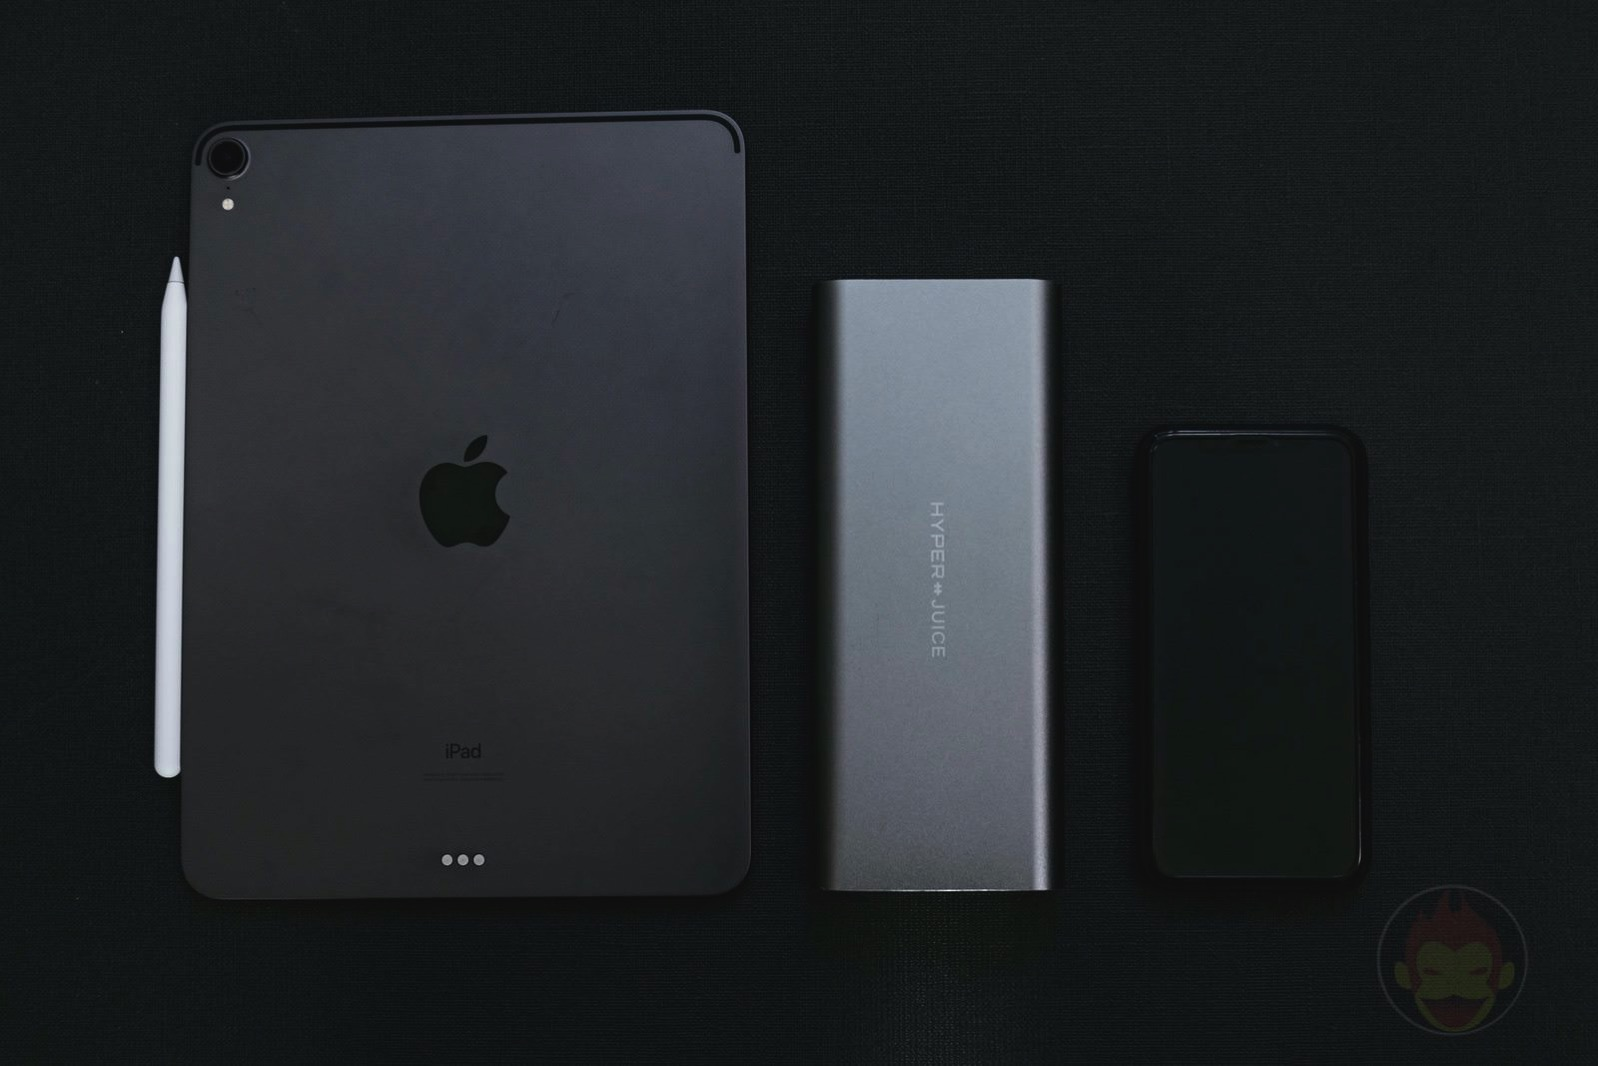 HyperJuice-100W-Mobile-Battery-Review-06.jpg